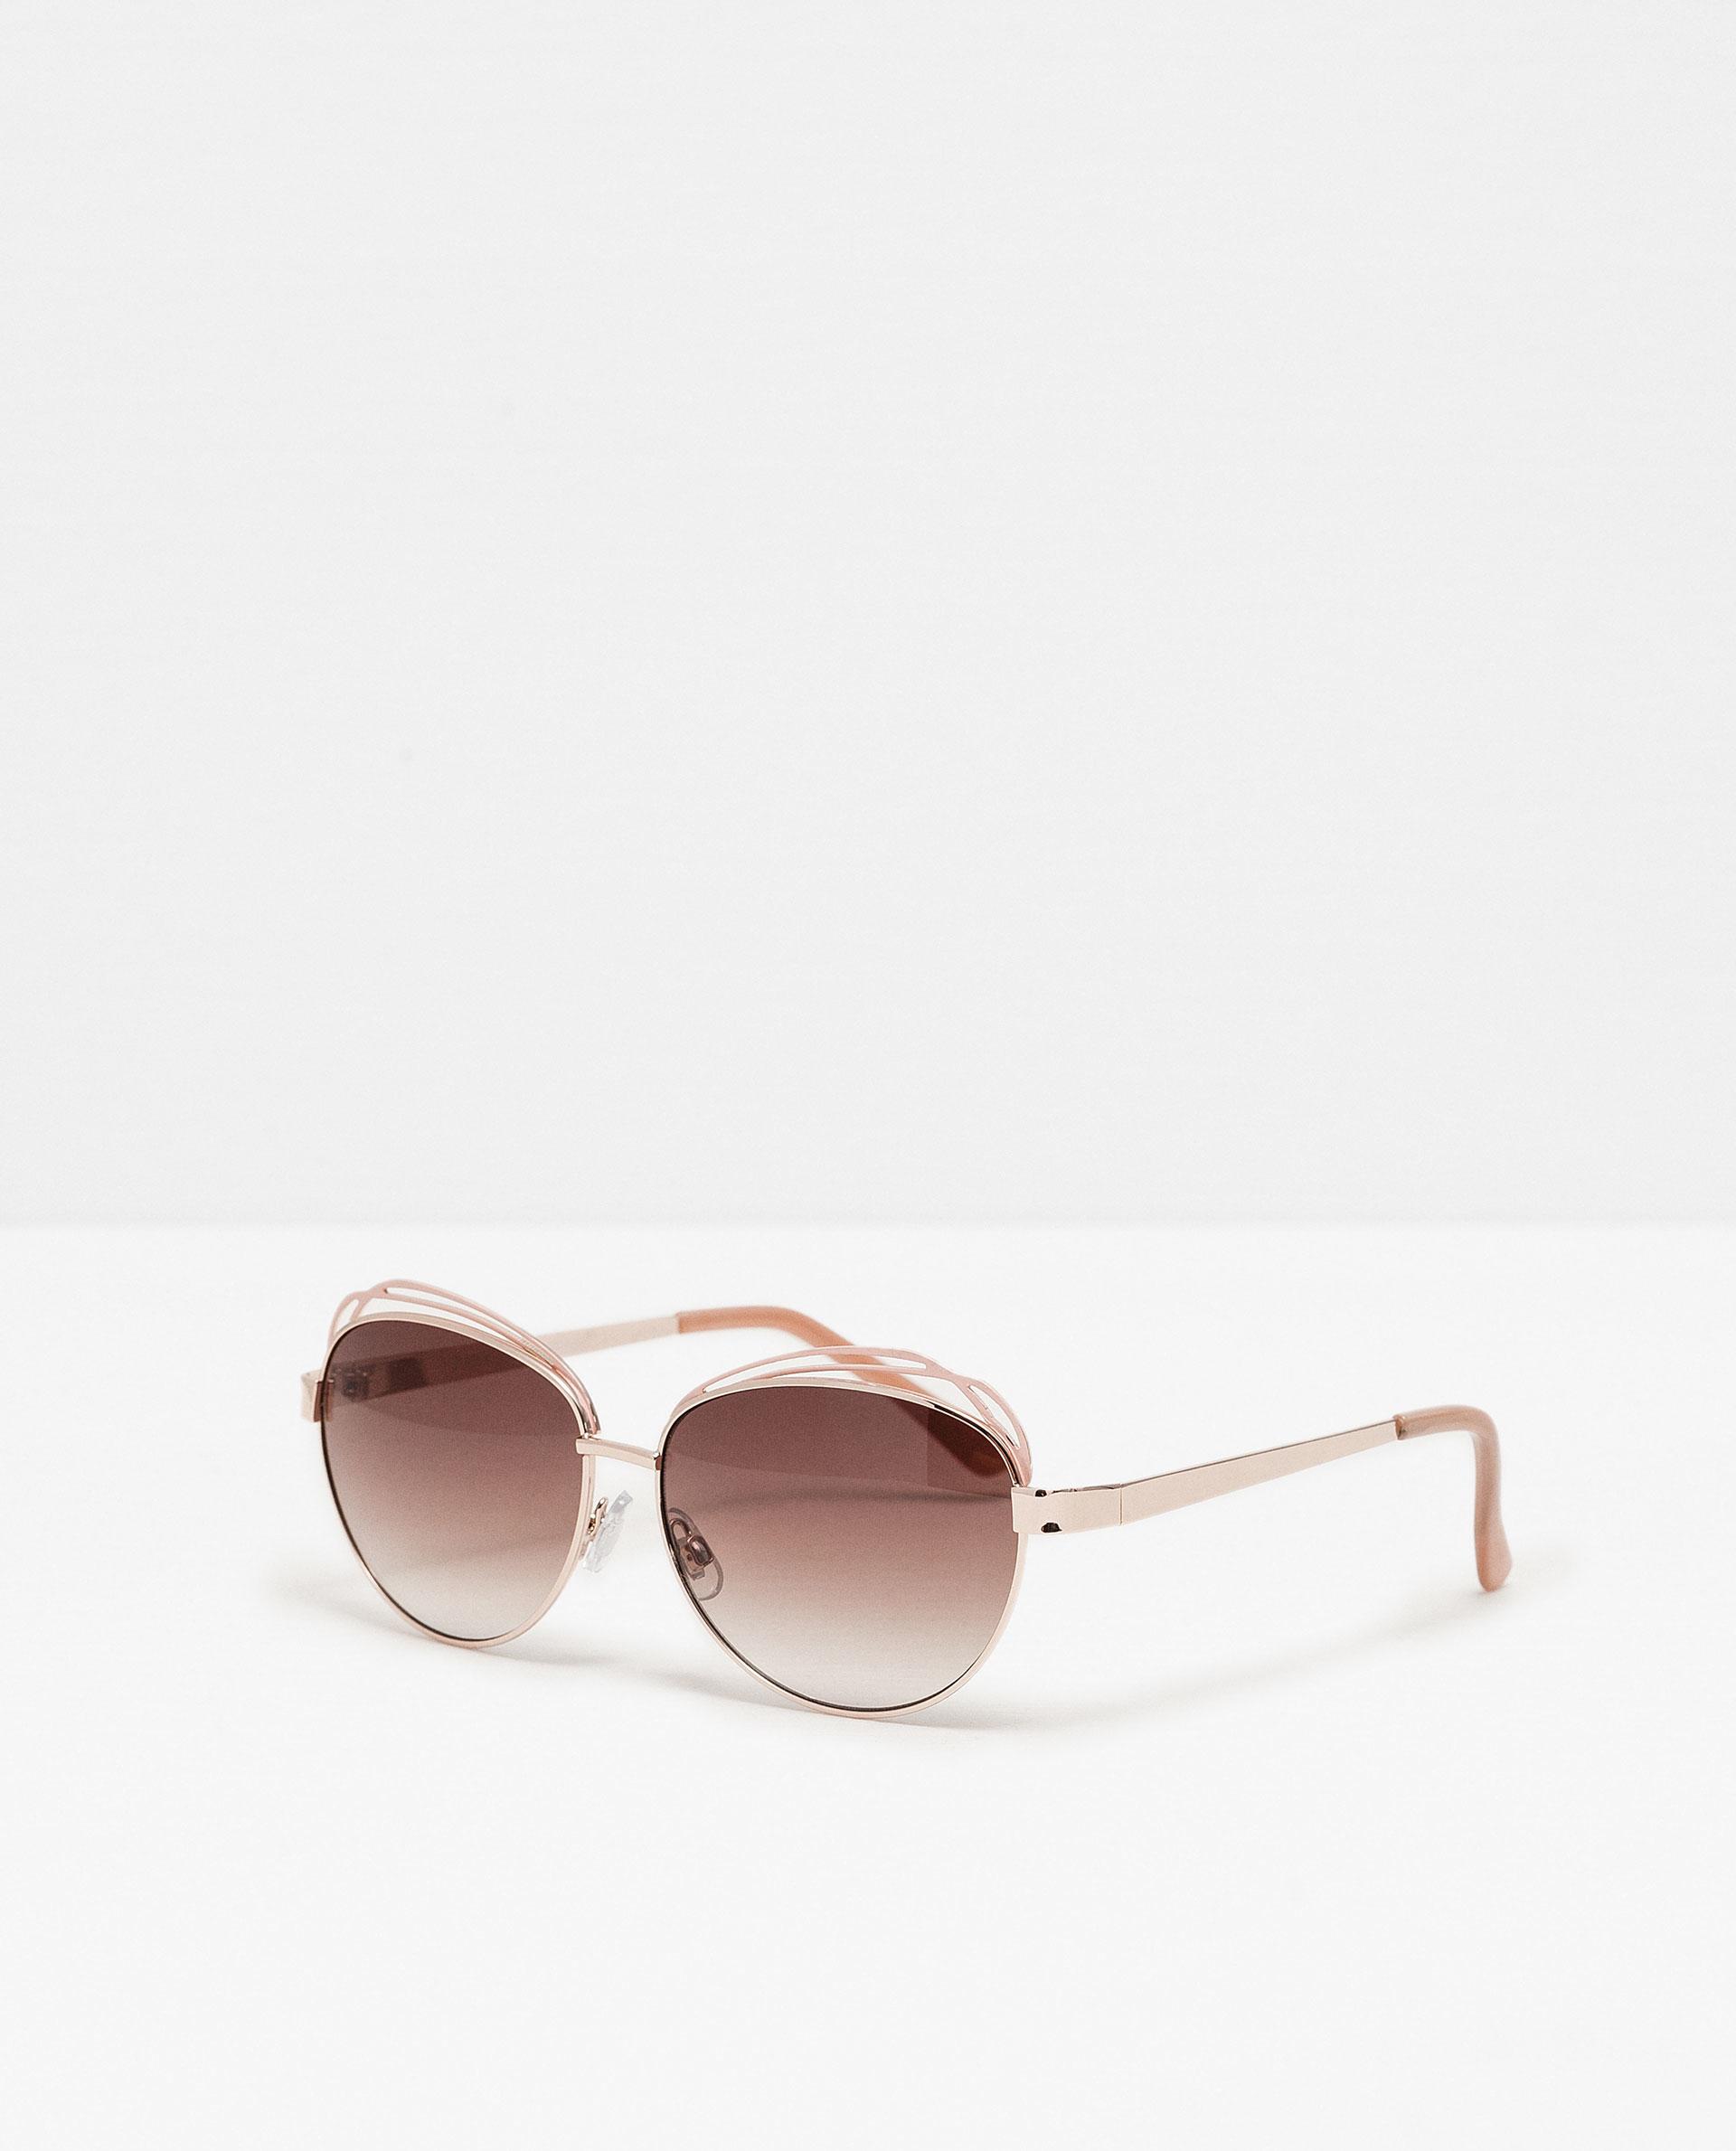 Zara Glasses Frames : Zara Metallic Sunglasses in Pink Lyst